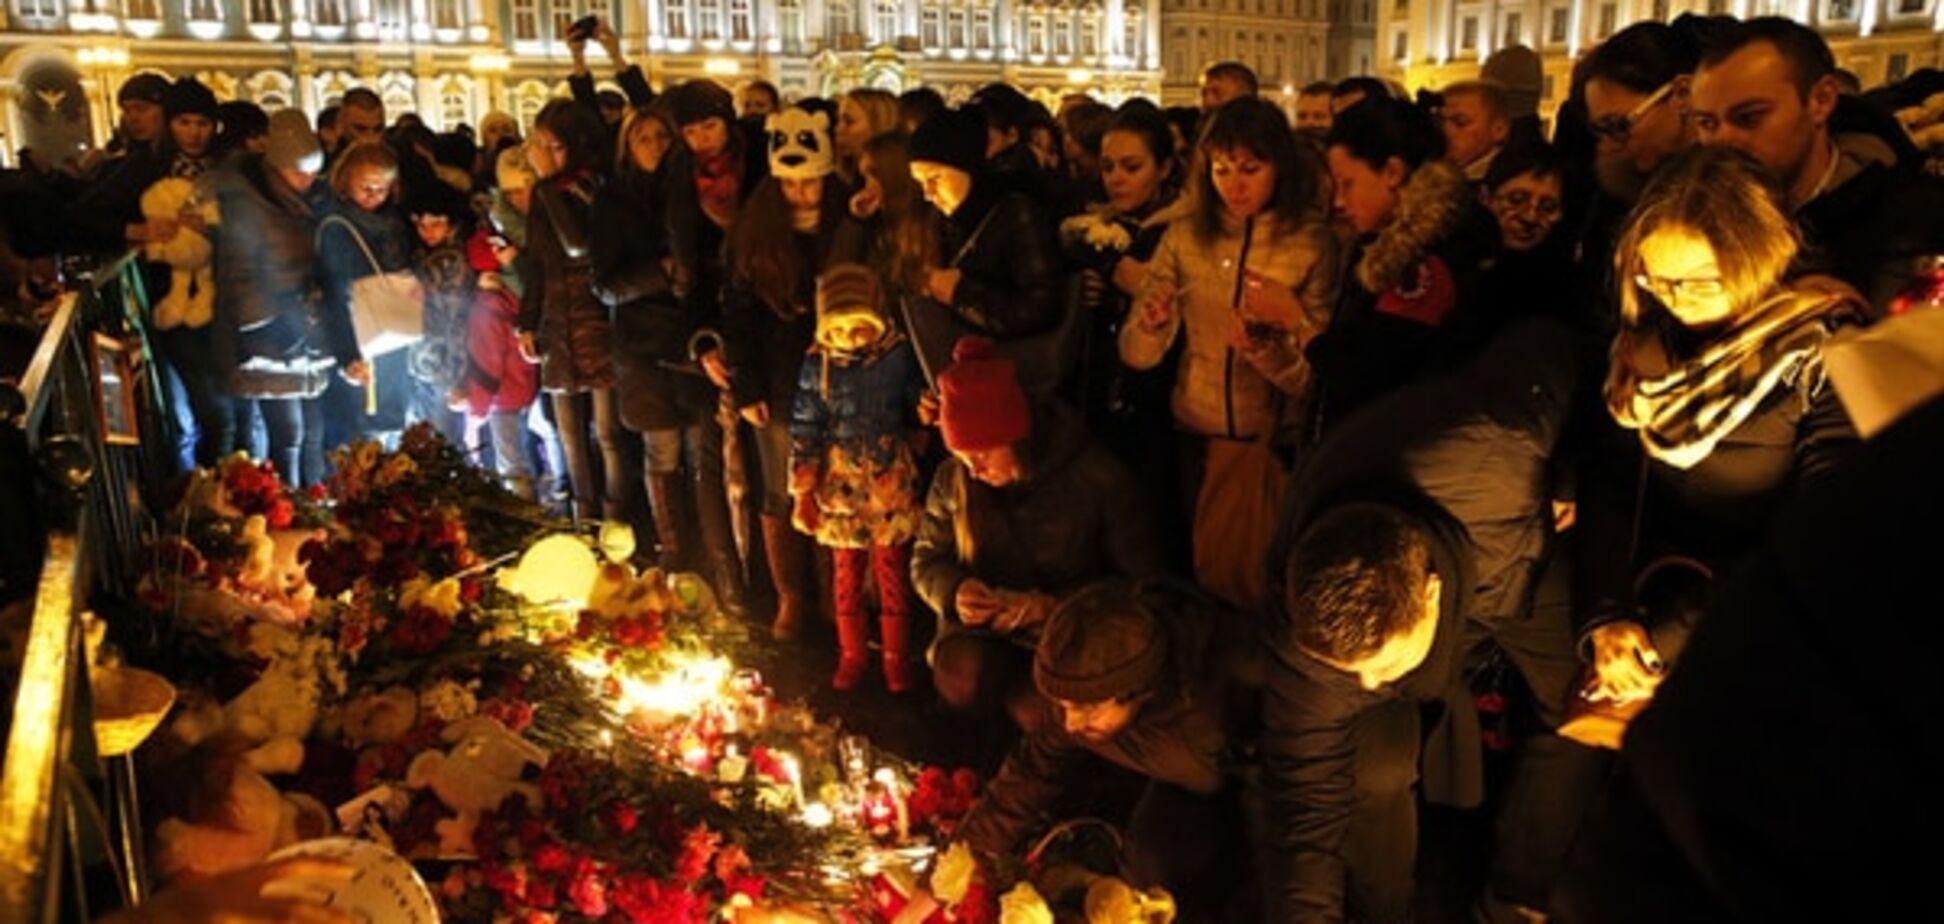 Азбука пиара: Адагамов объяснил, почему Путин молчит об авиакатастрофе